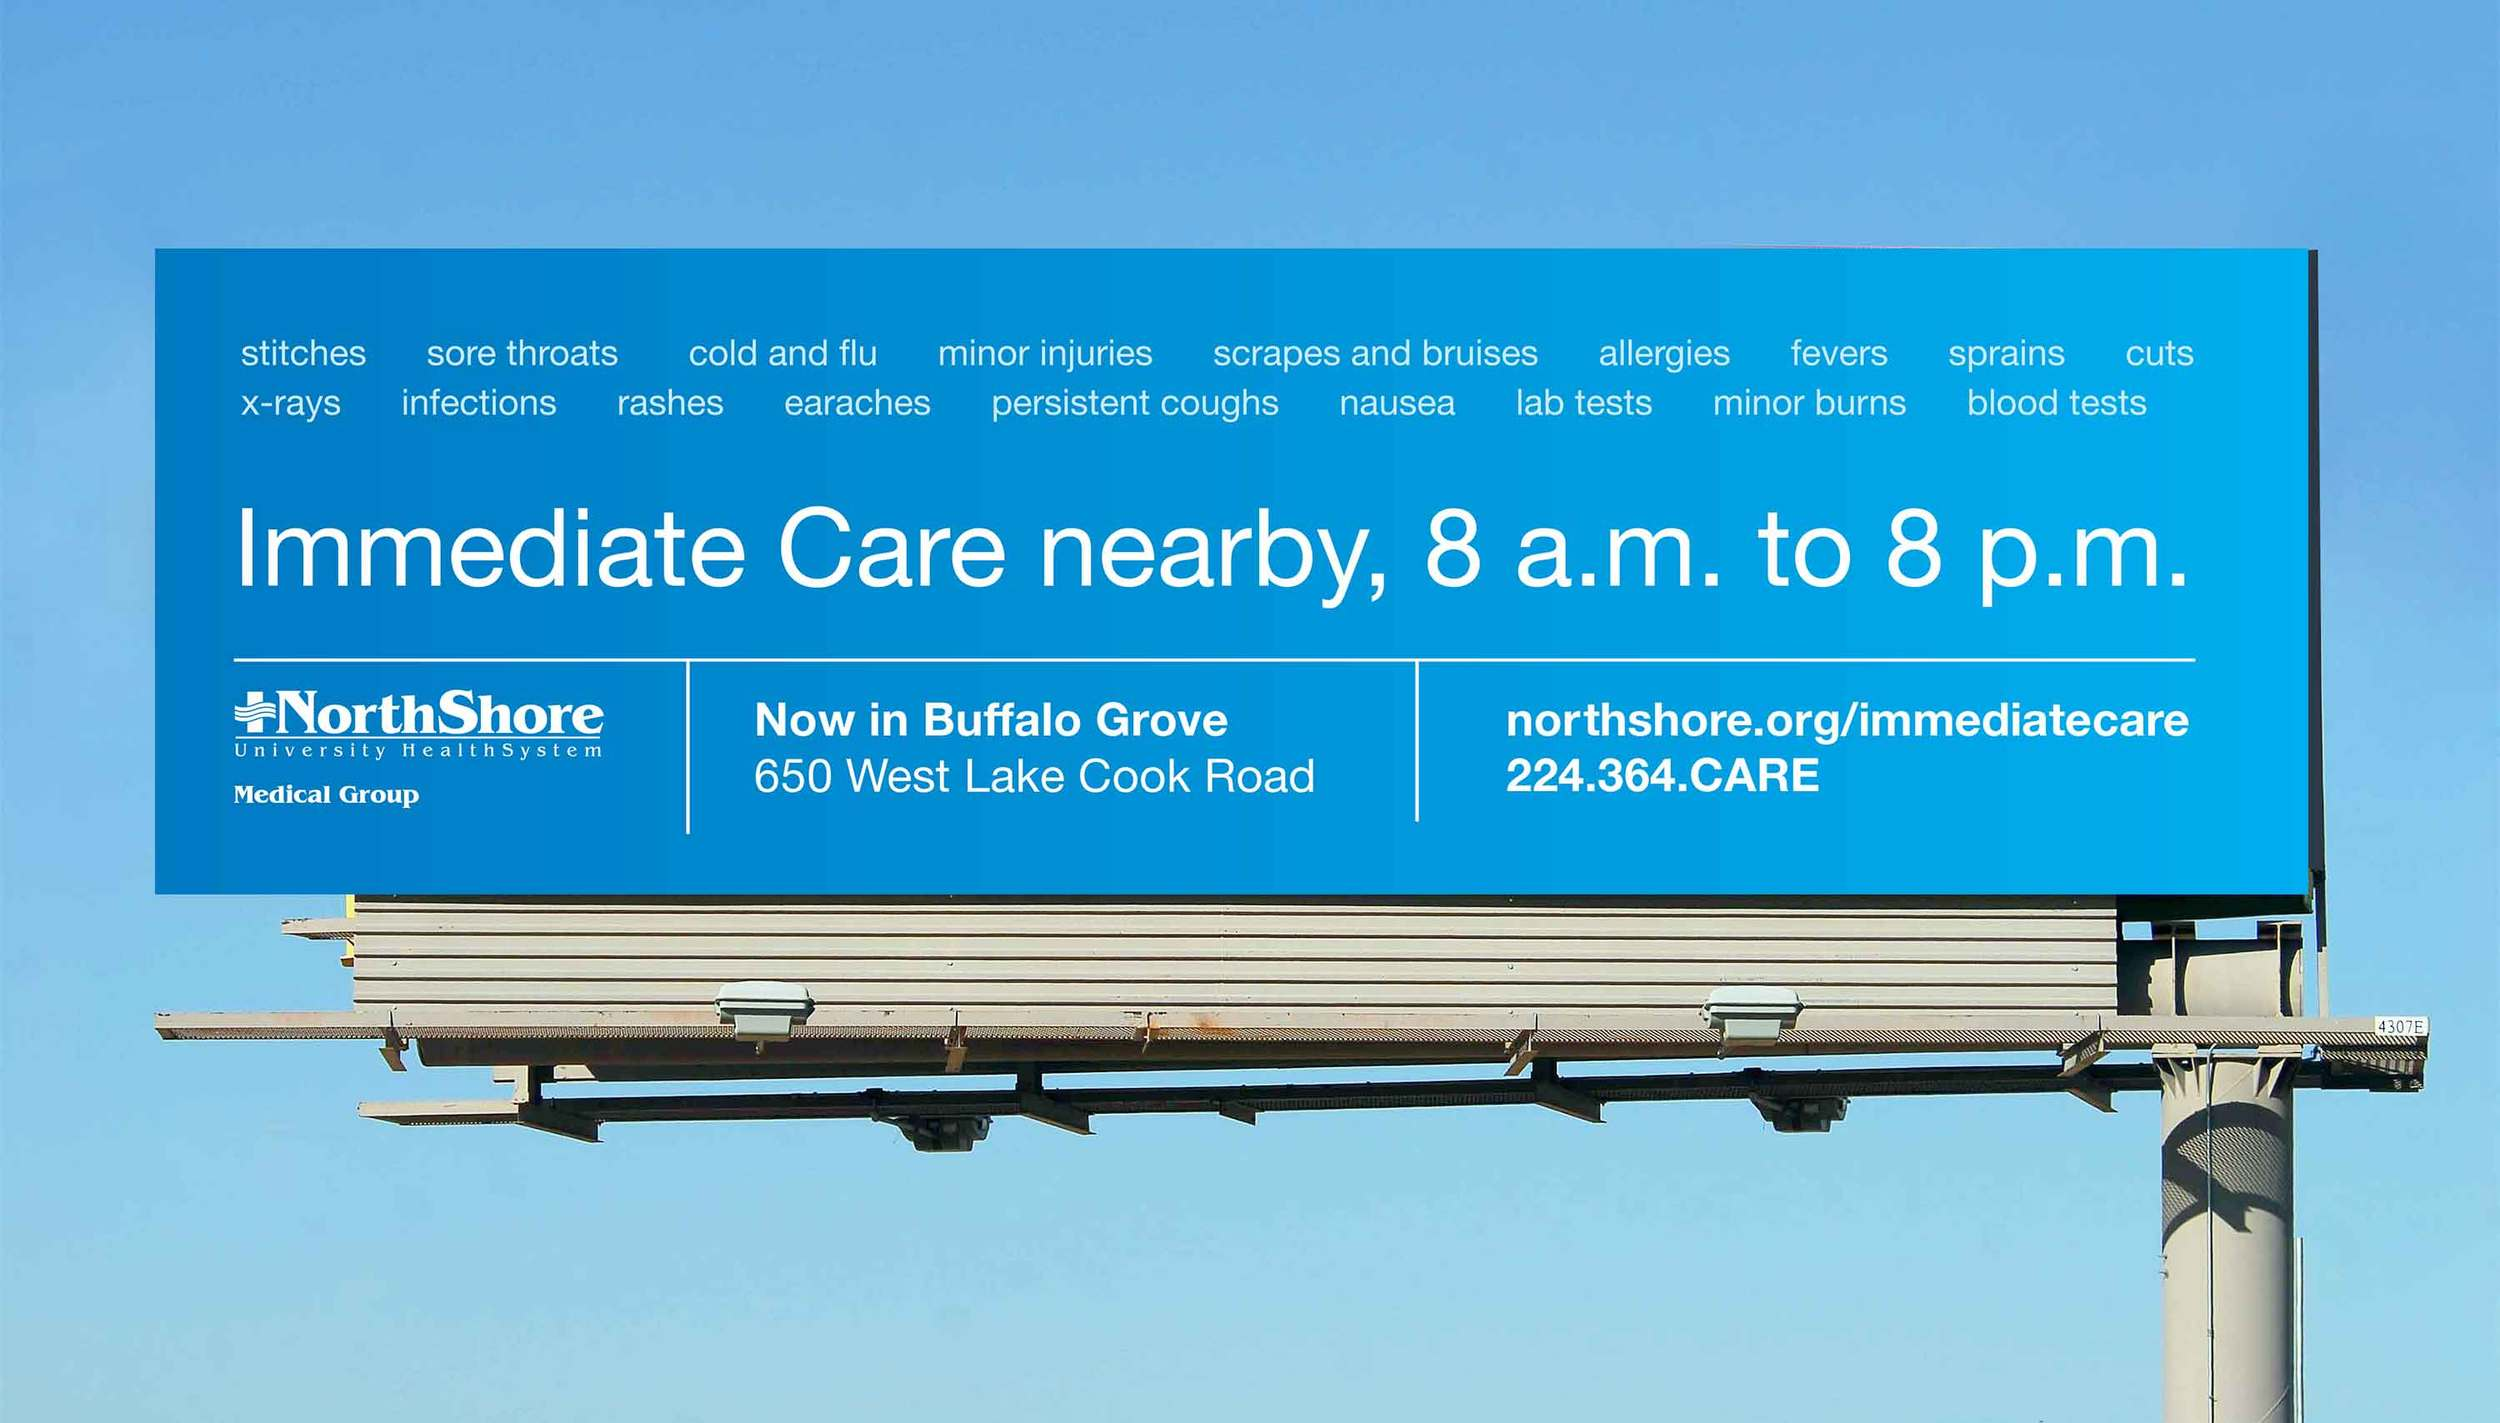 billboard-healthcare-elenapotter.jpg